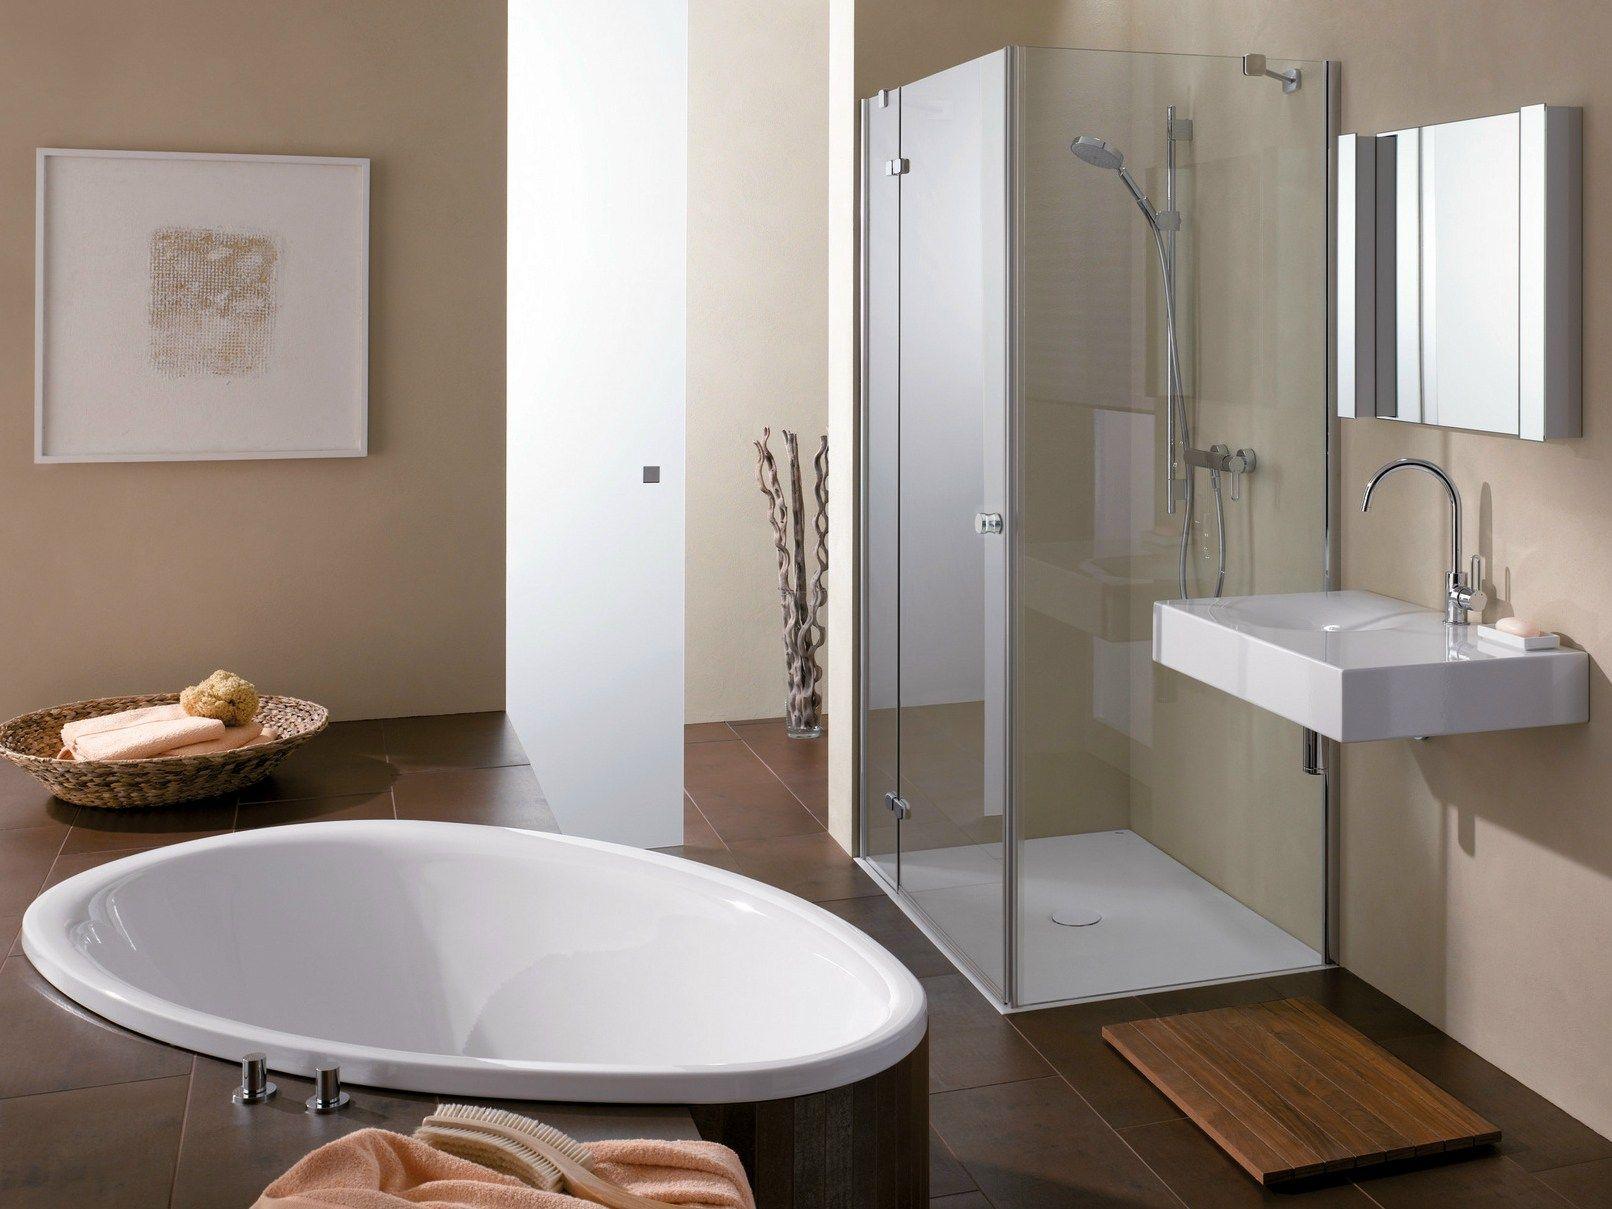 baignoire encastrable en acier maill bettepool oval by bette design schmiddem design. Black Bedroom Furniture Sets. Home Design Ideas